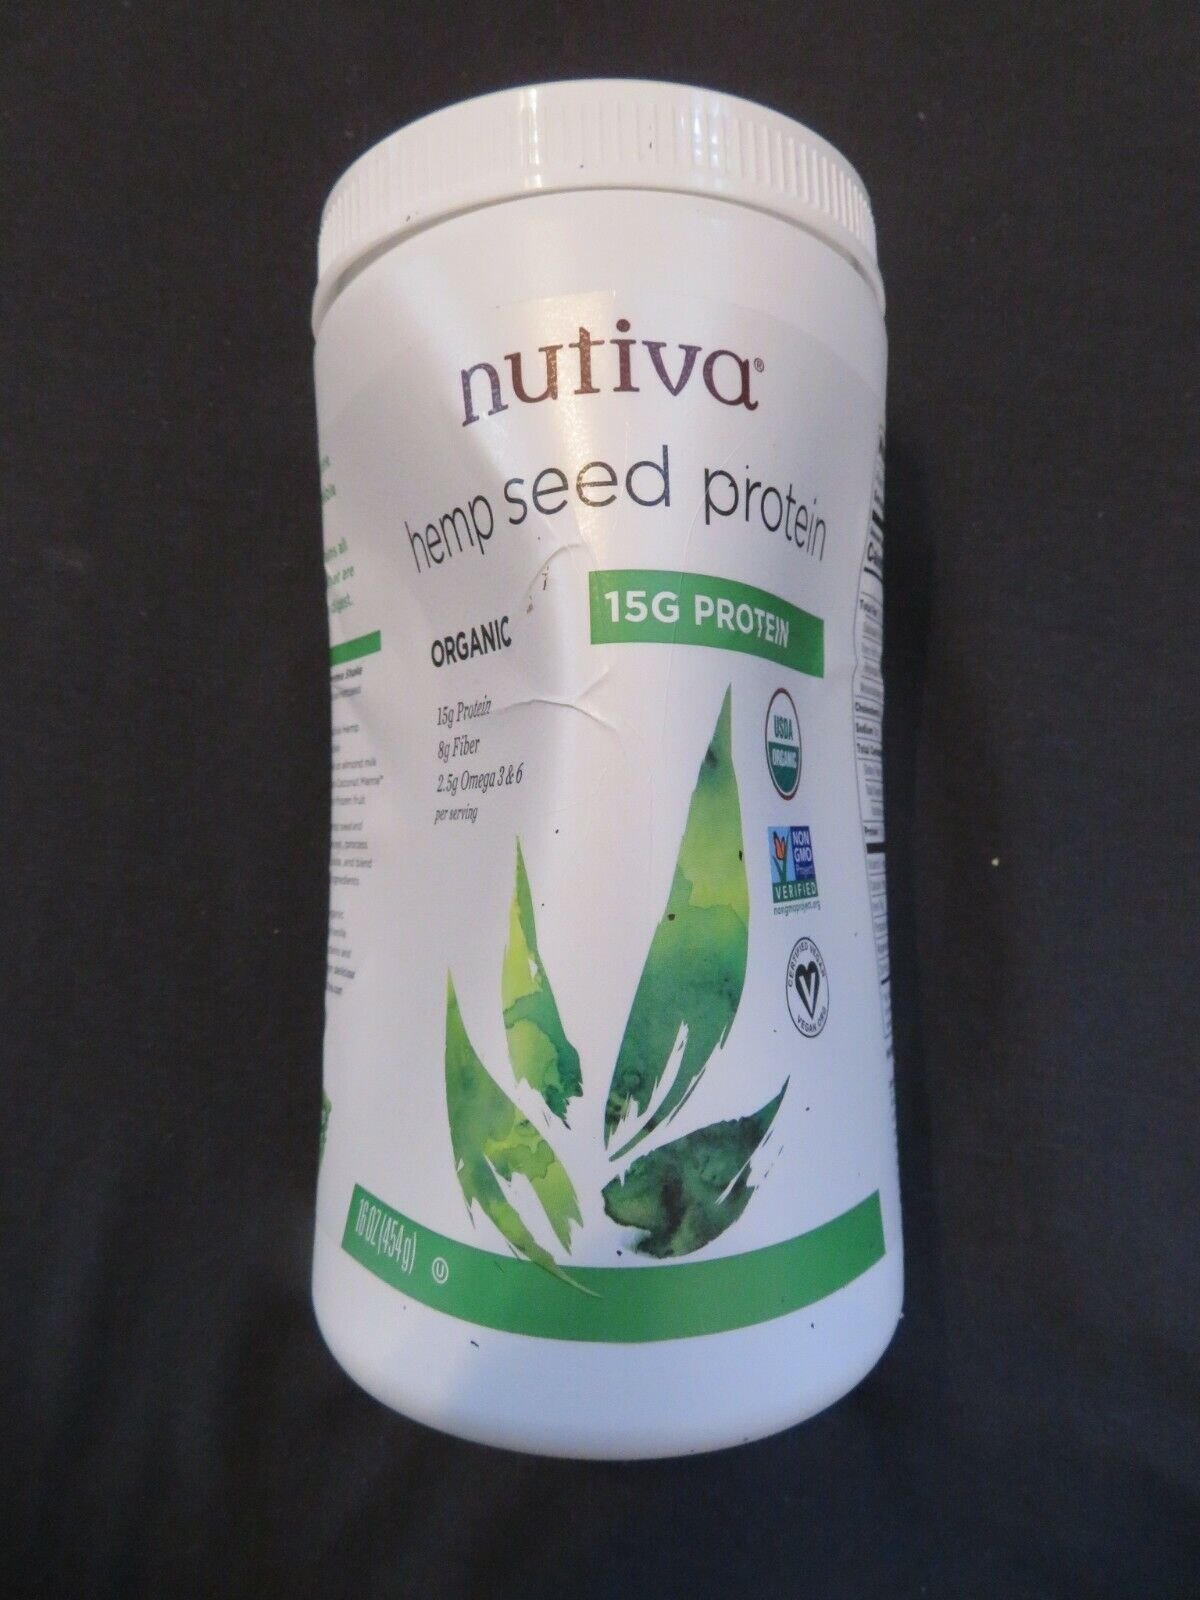 Nutiva Hemp Seed Protein Organic 15 g Protein 16 Oz 15 Servings @4